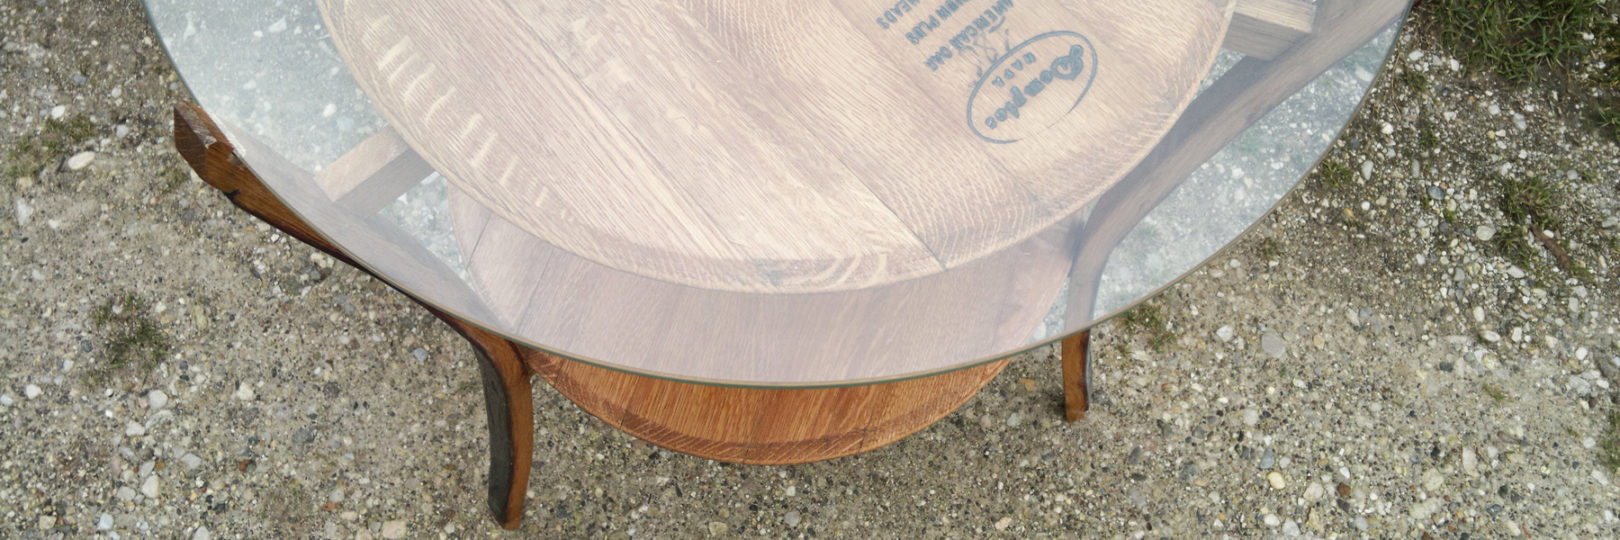 pasquali-alessandro-design-tavolino-barrique